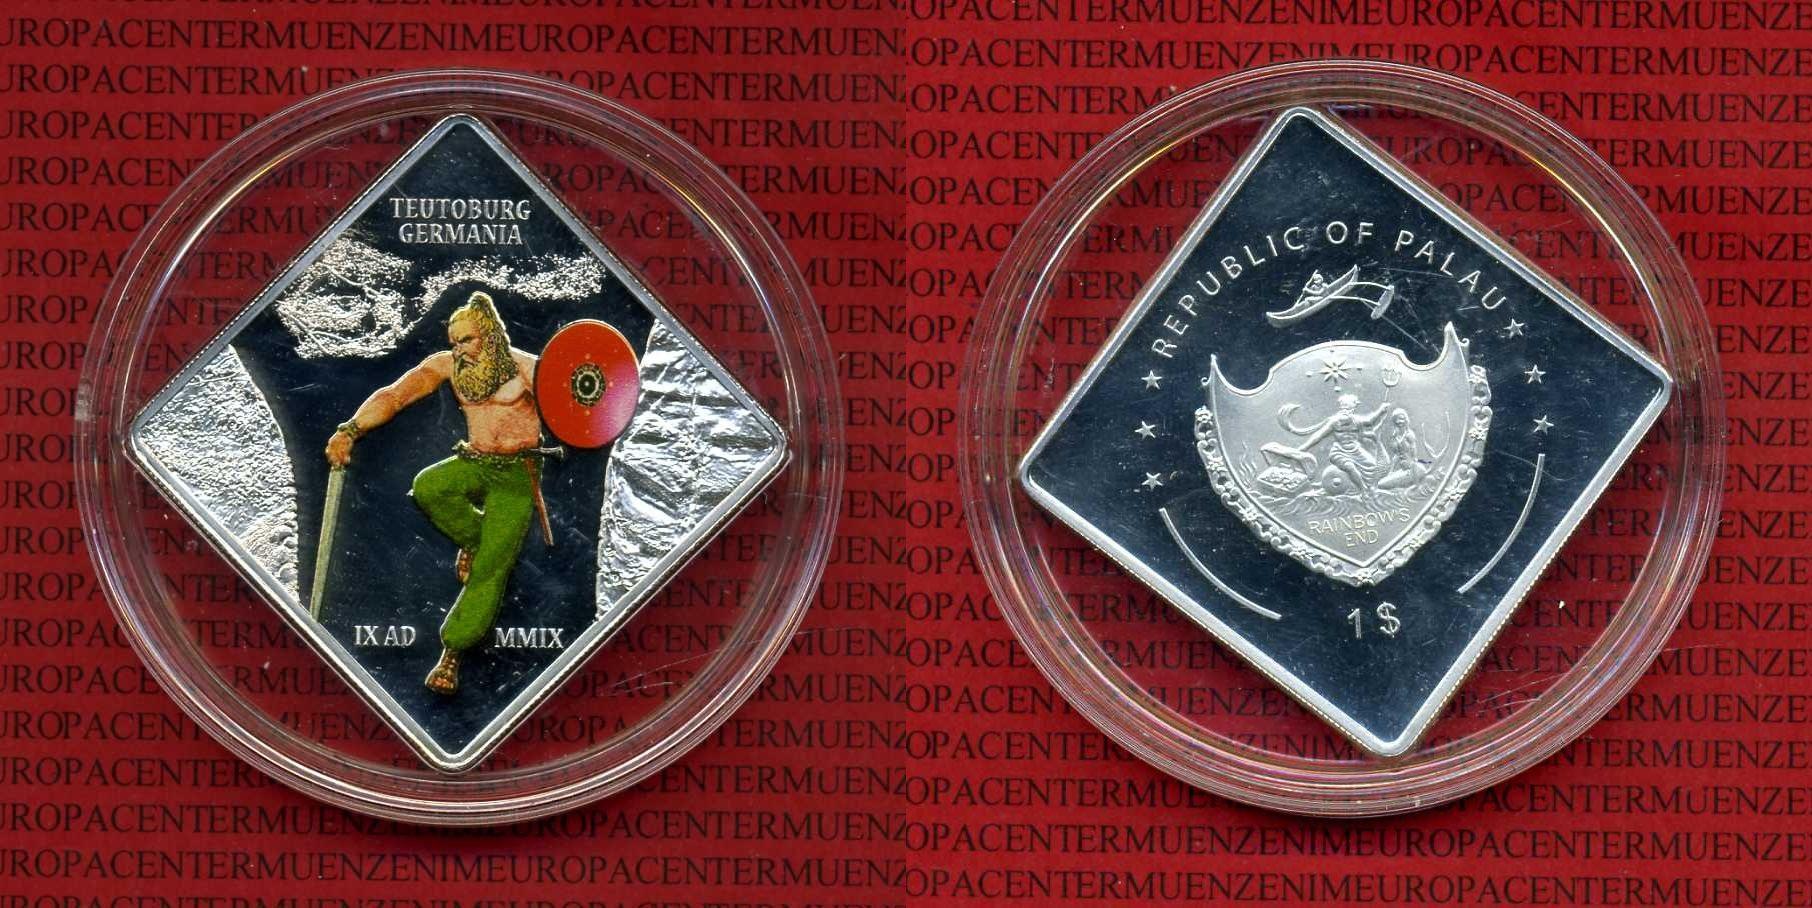 1 Dollar rechteckig Farbmünze 2009 Palau Palau 1 Dollar 2009 2000 Jahre Schlacht im Teutoburger Wald, Germane BU